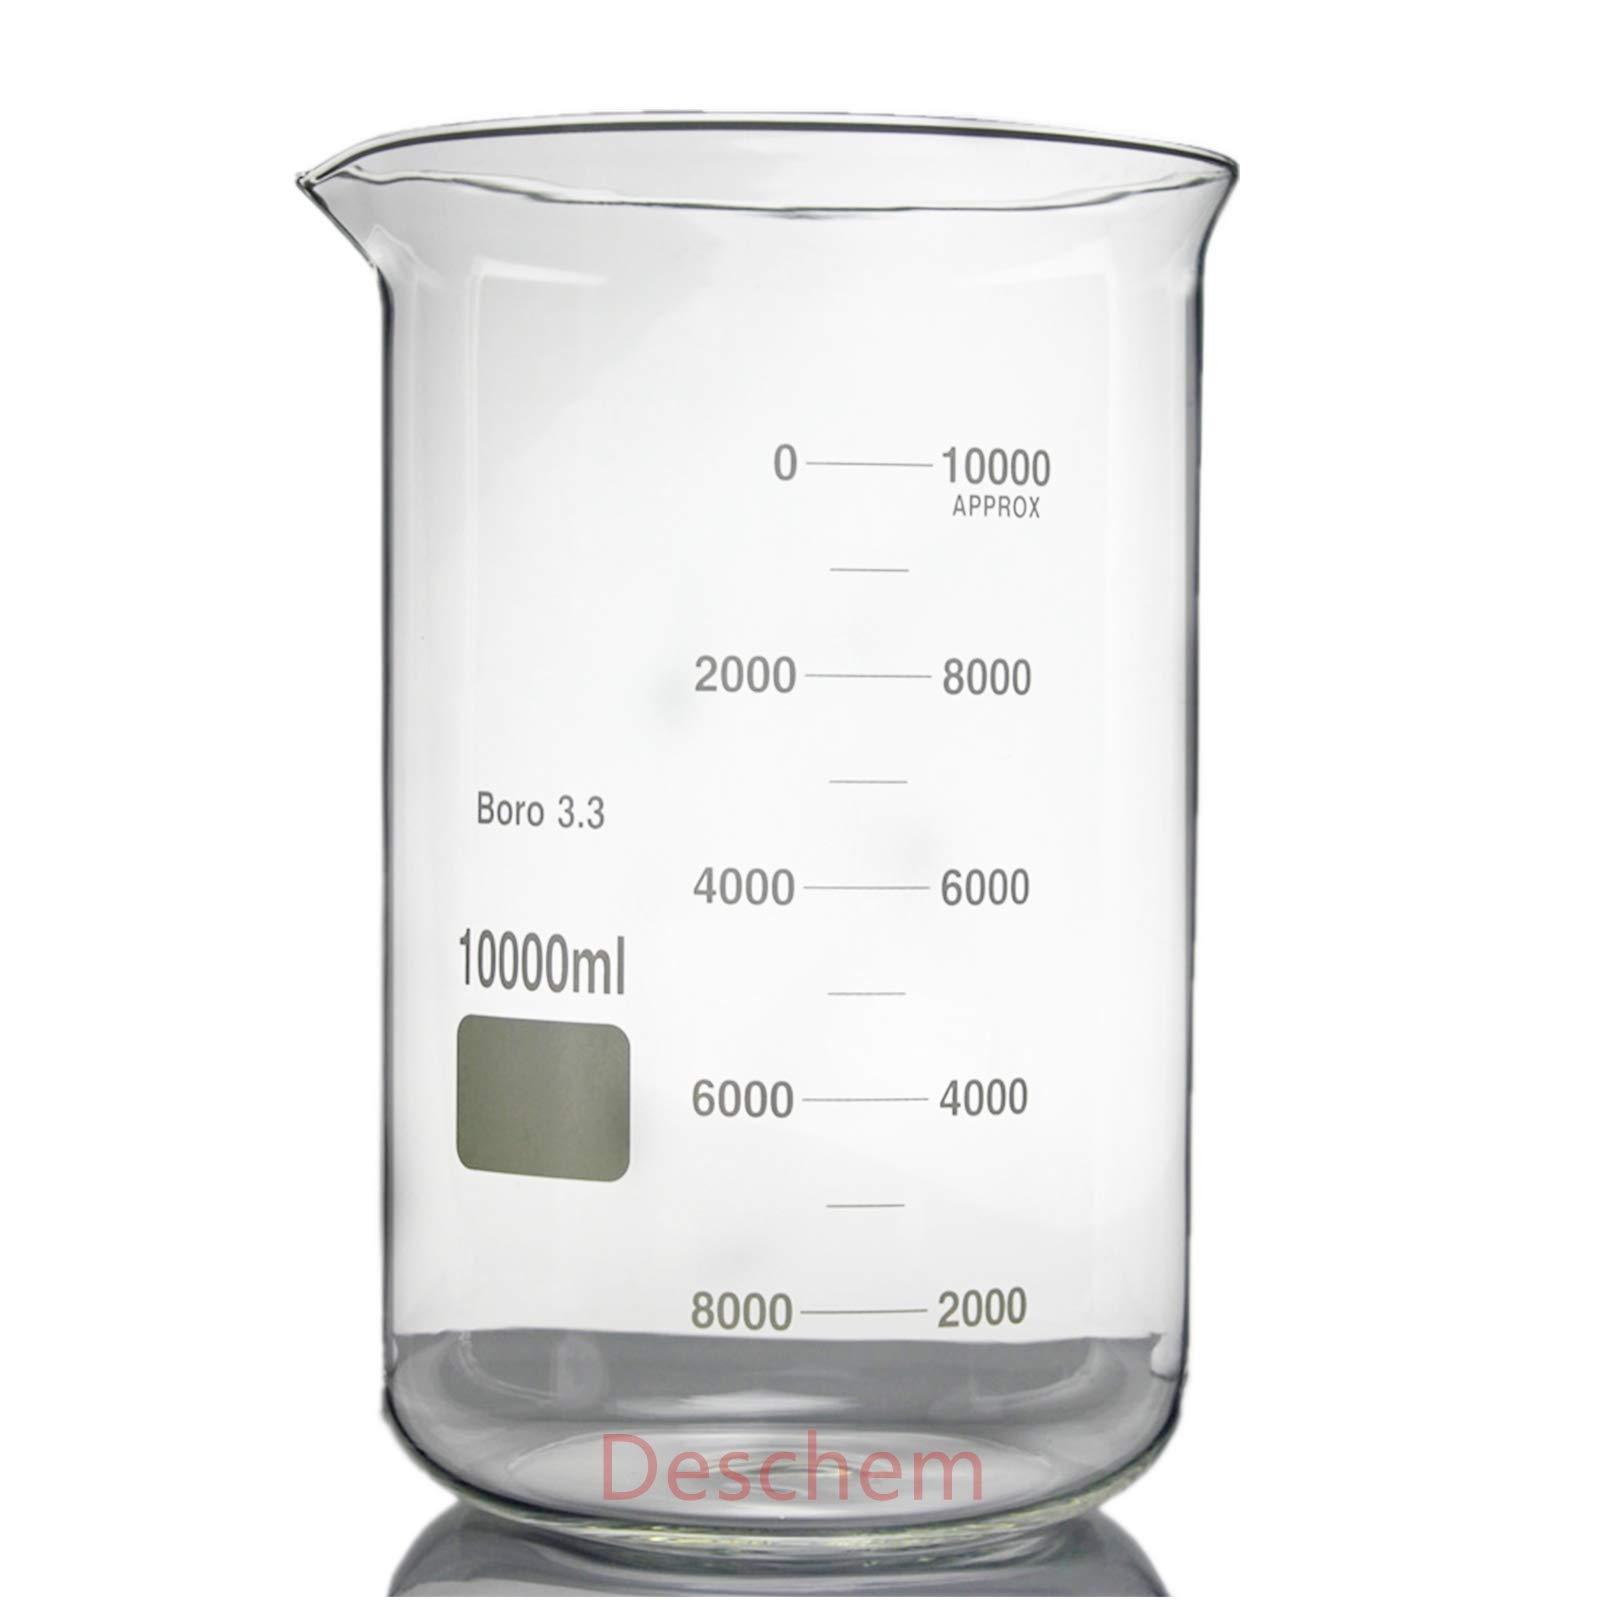 10000mL Borosilicate Glass Beaker,10Litre Low Form,Spout Mouth,New Lab Glassware